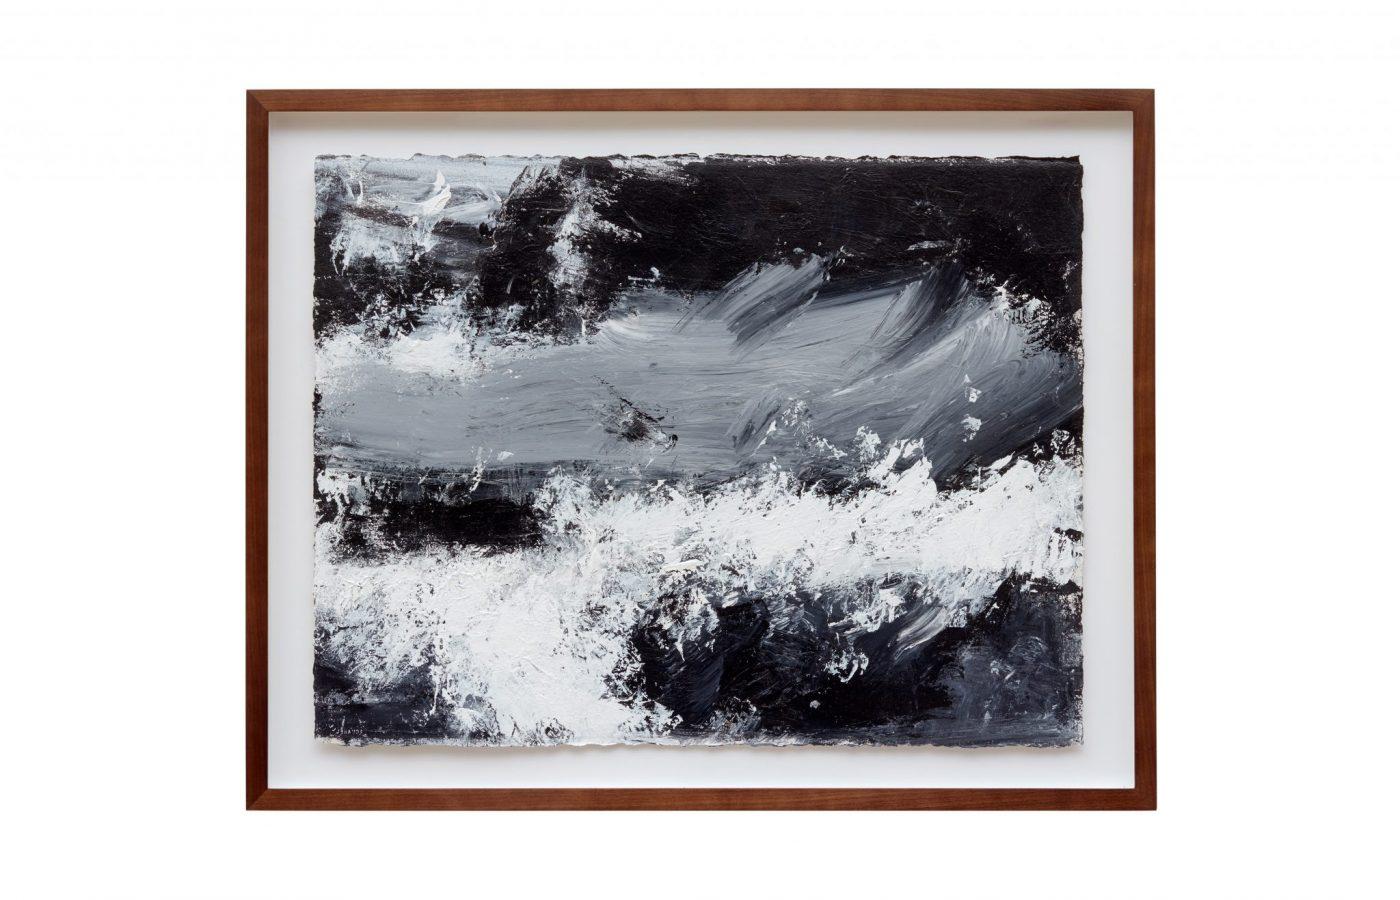 FXF18-28 John Virtue Untitled No 15 2014